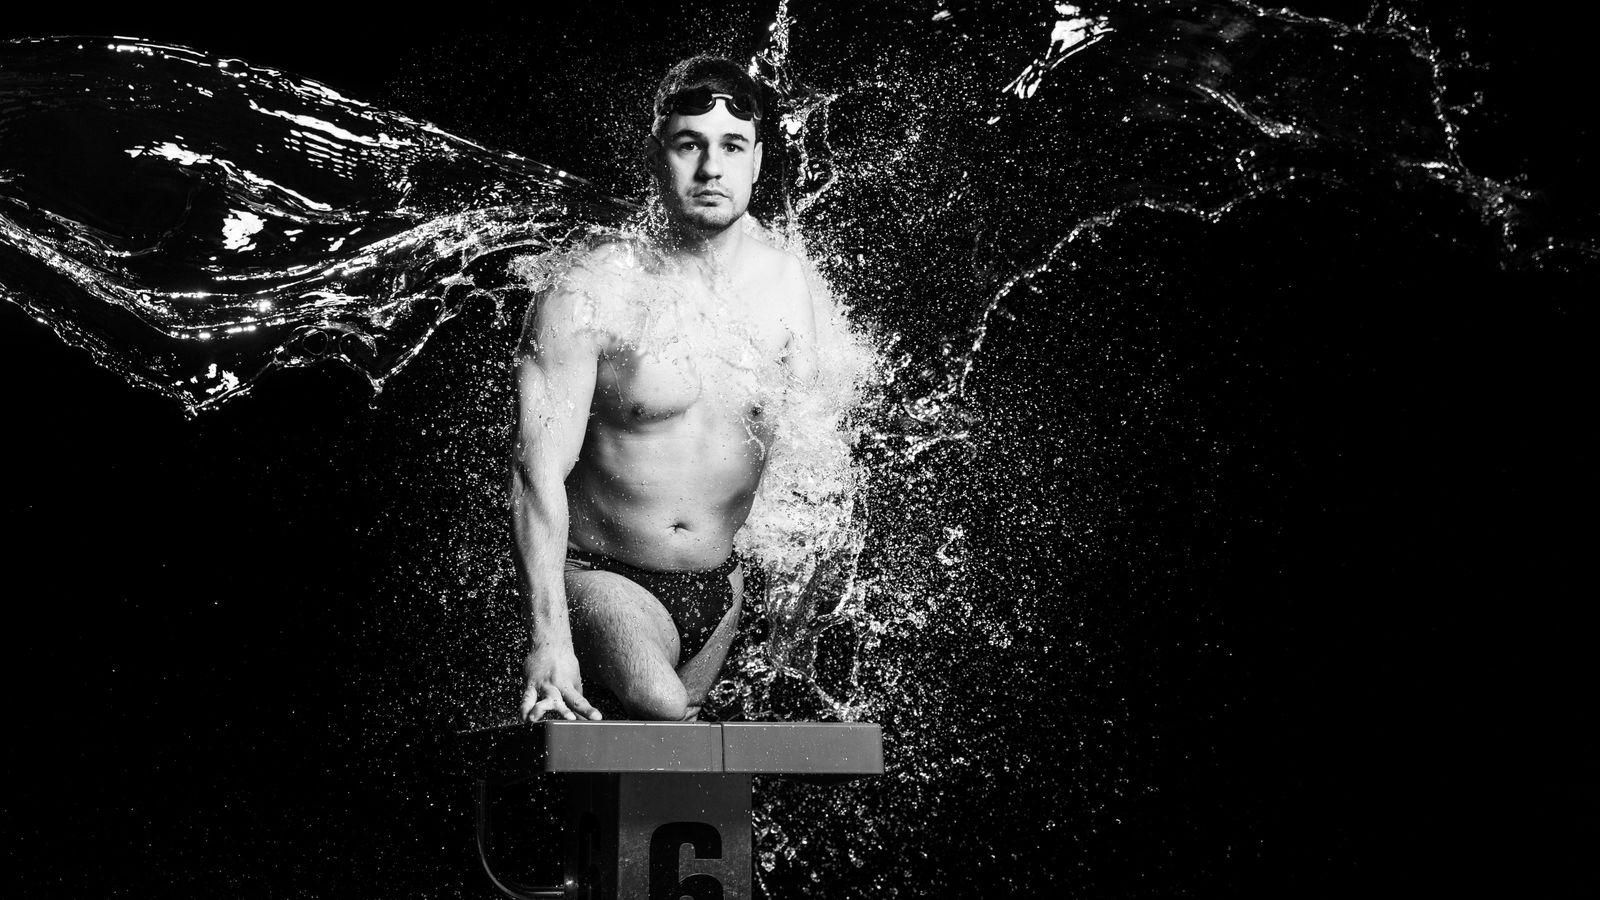 2012 brach er den Weltrekord in der Schmetterling-Klasse S4 über 50 m. Der Sportfotograf Samo Vidic ...